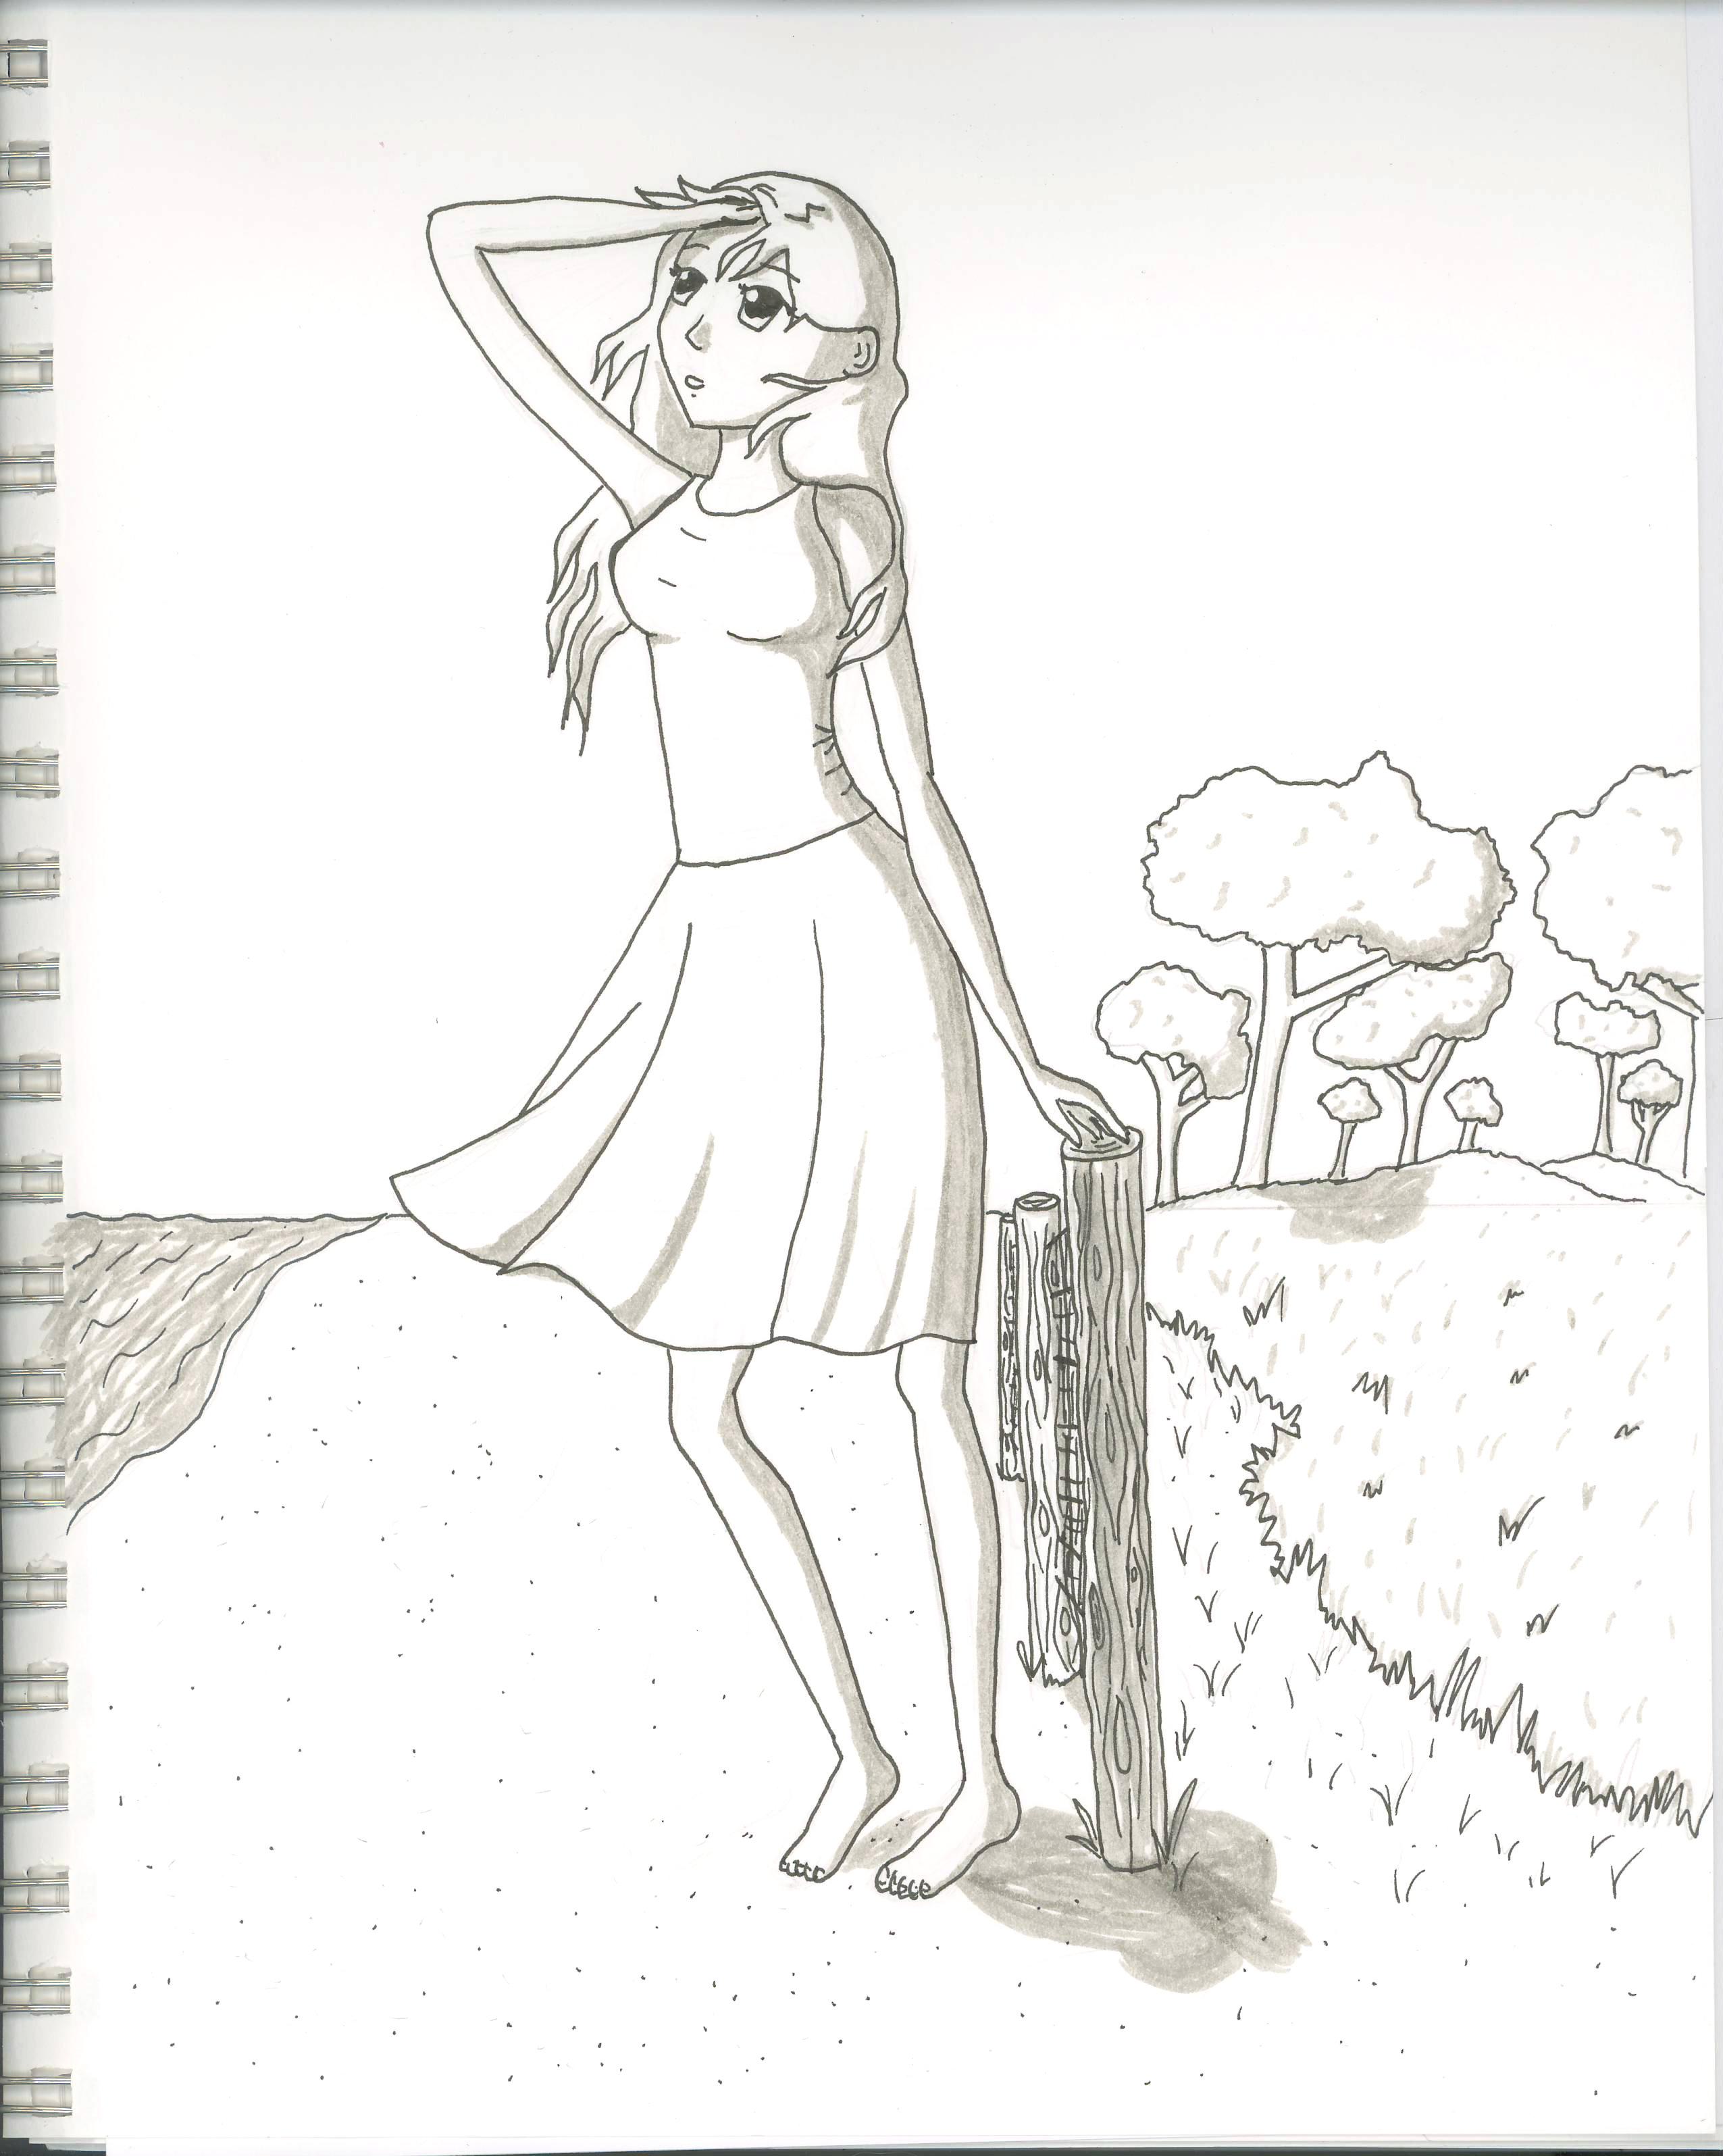 2551x3192 More Ink Drawings! Cricket's Drawings